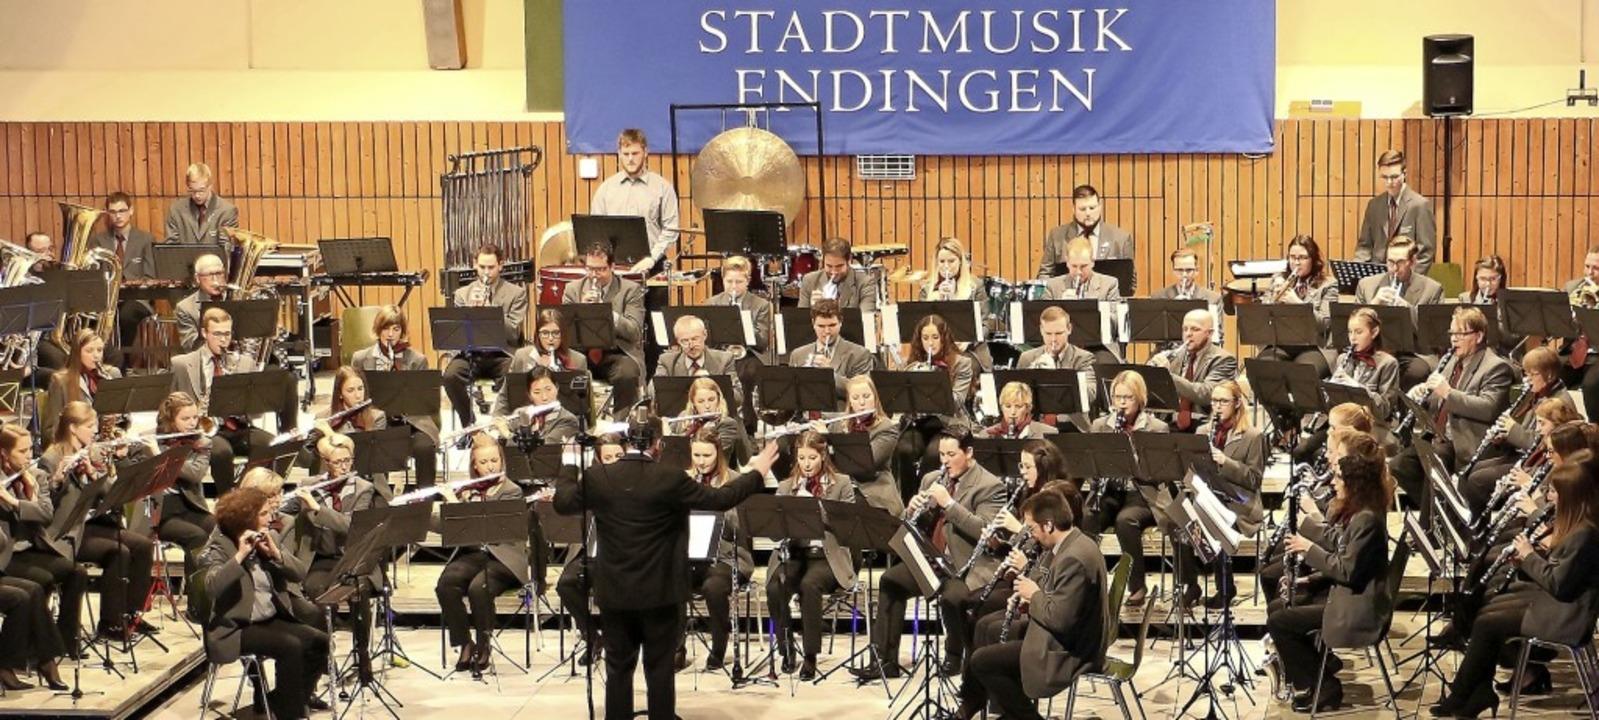 März 2018: die Stadtmusik Endingen (Ausschnitt) mit   Martin Baumgartner  | Foto: Martin Wendel